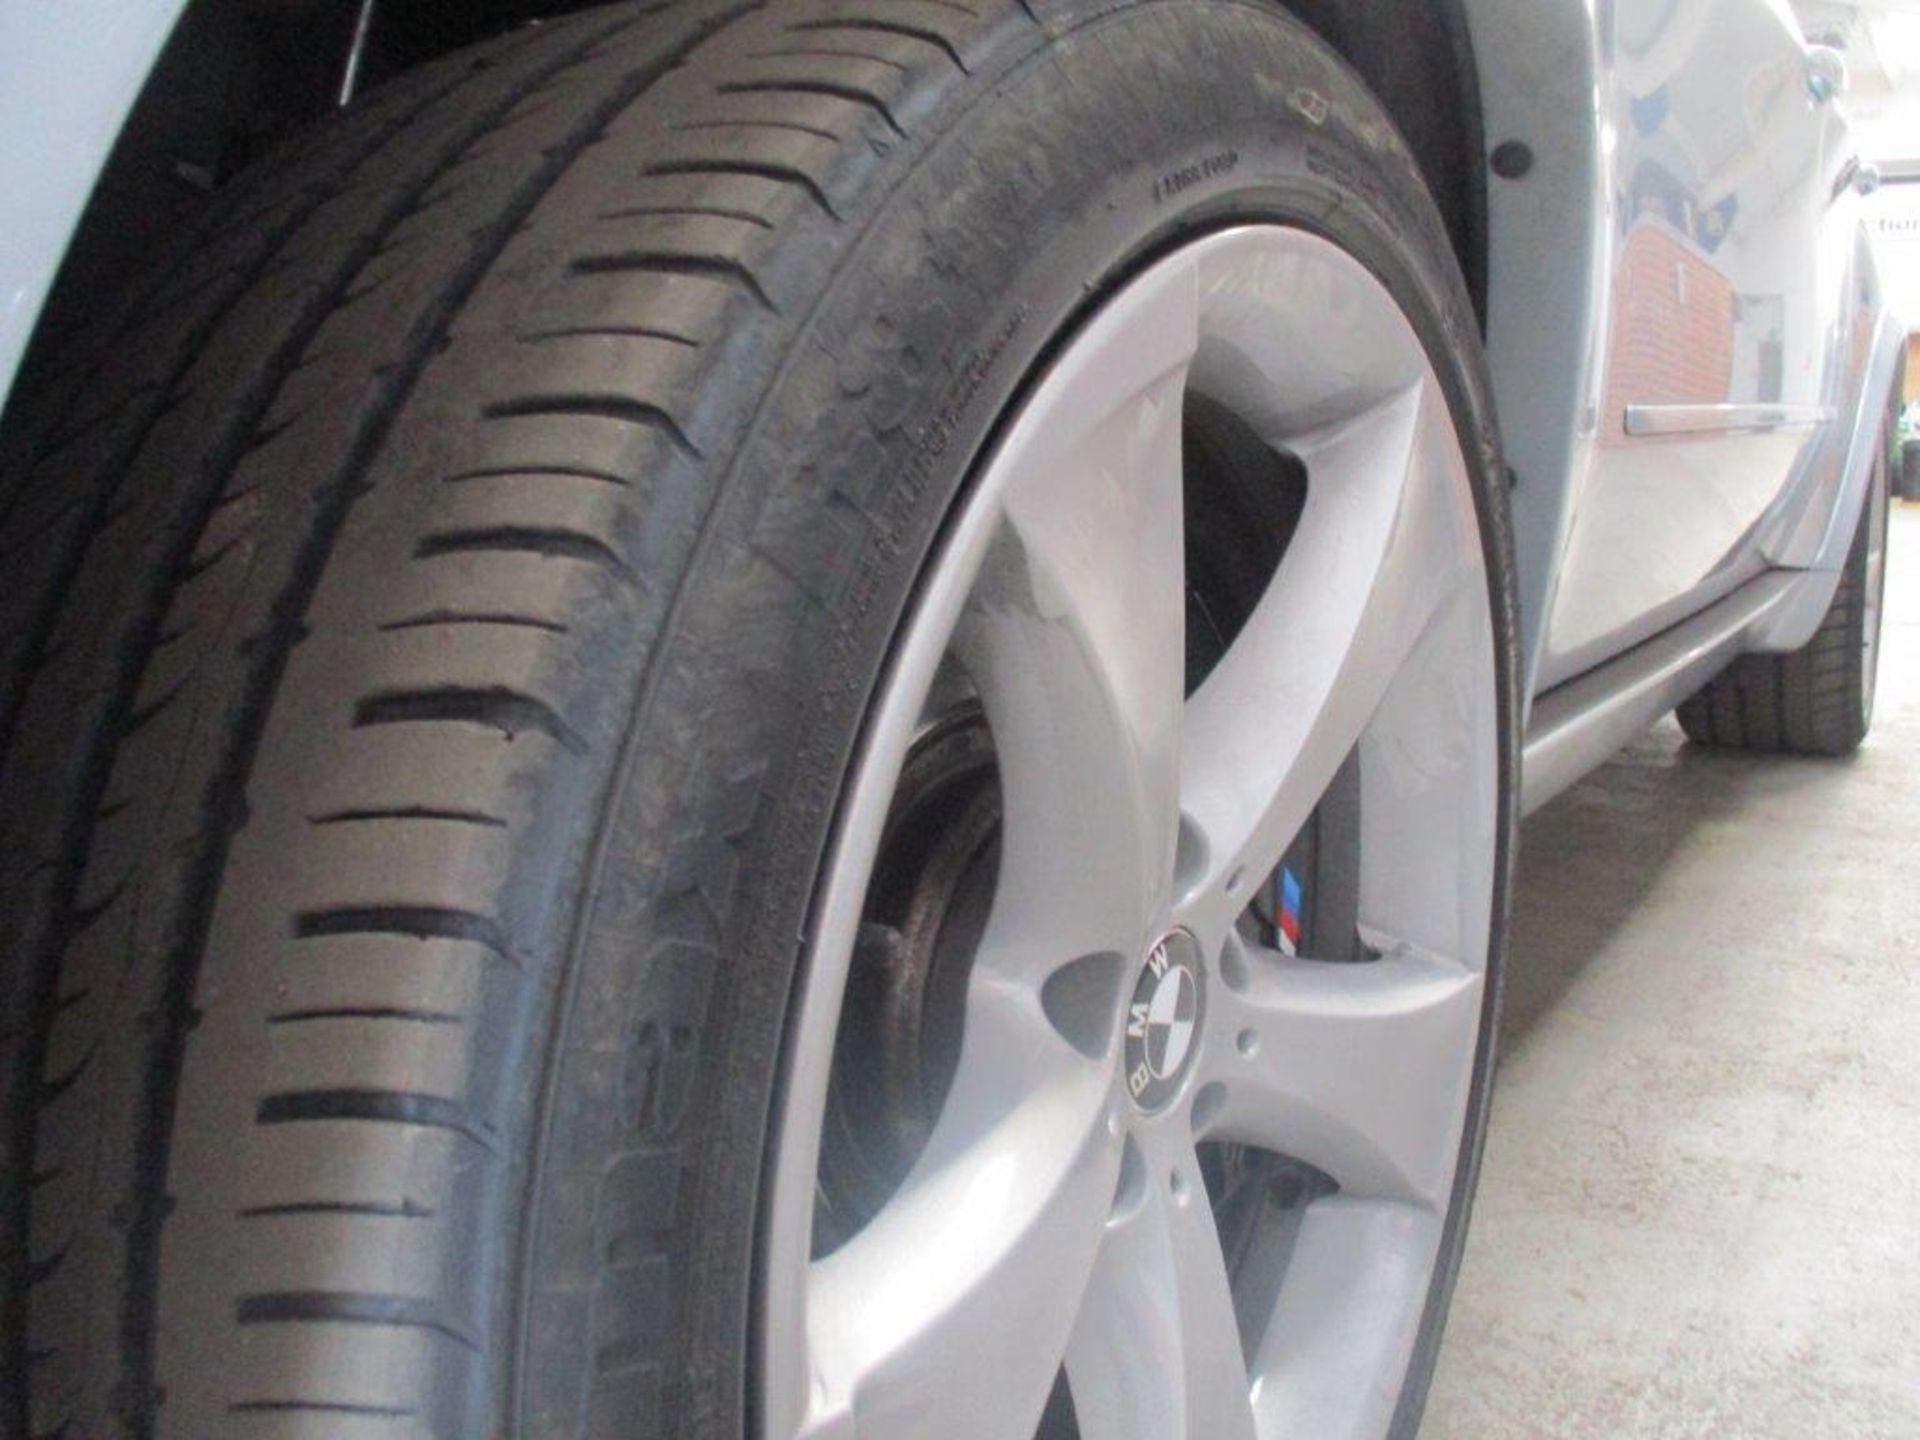 60 10 BMW X5 M Turbo Auto - Image 10 of 35